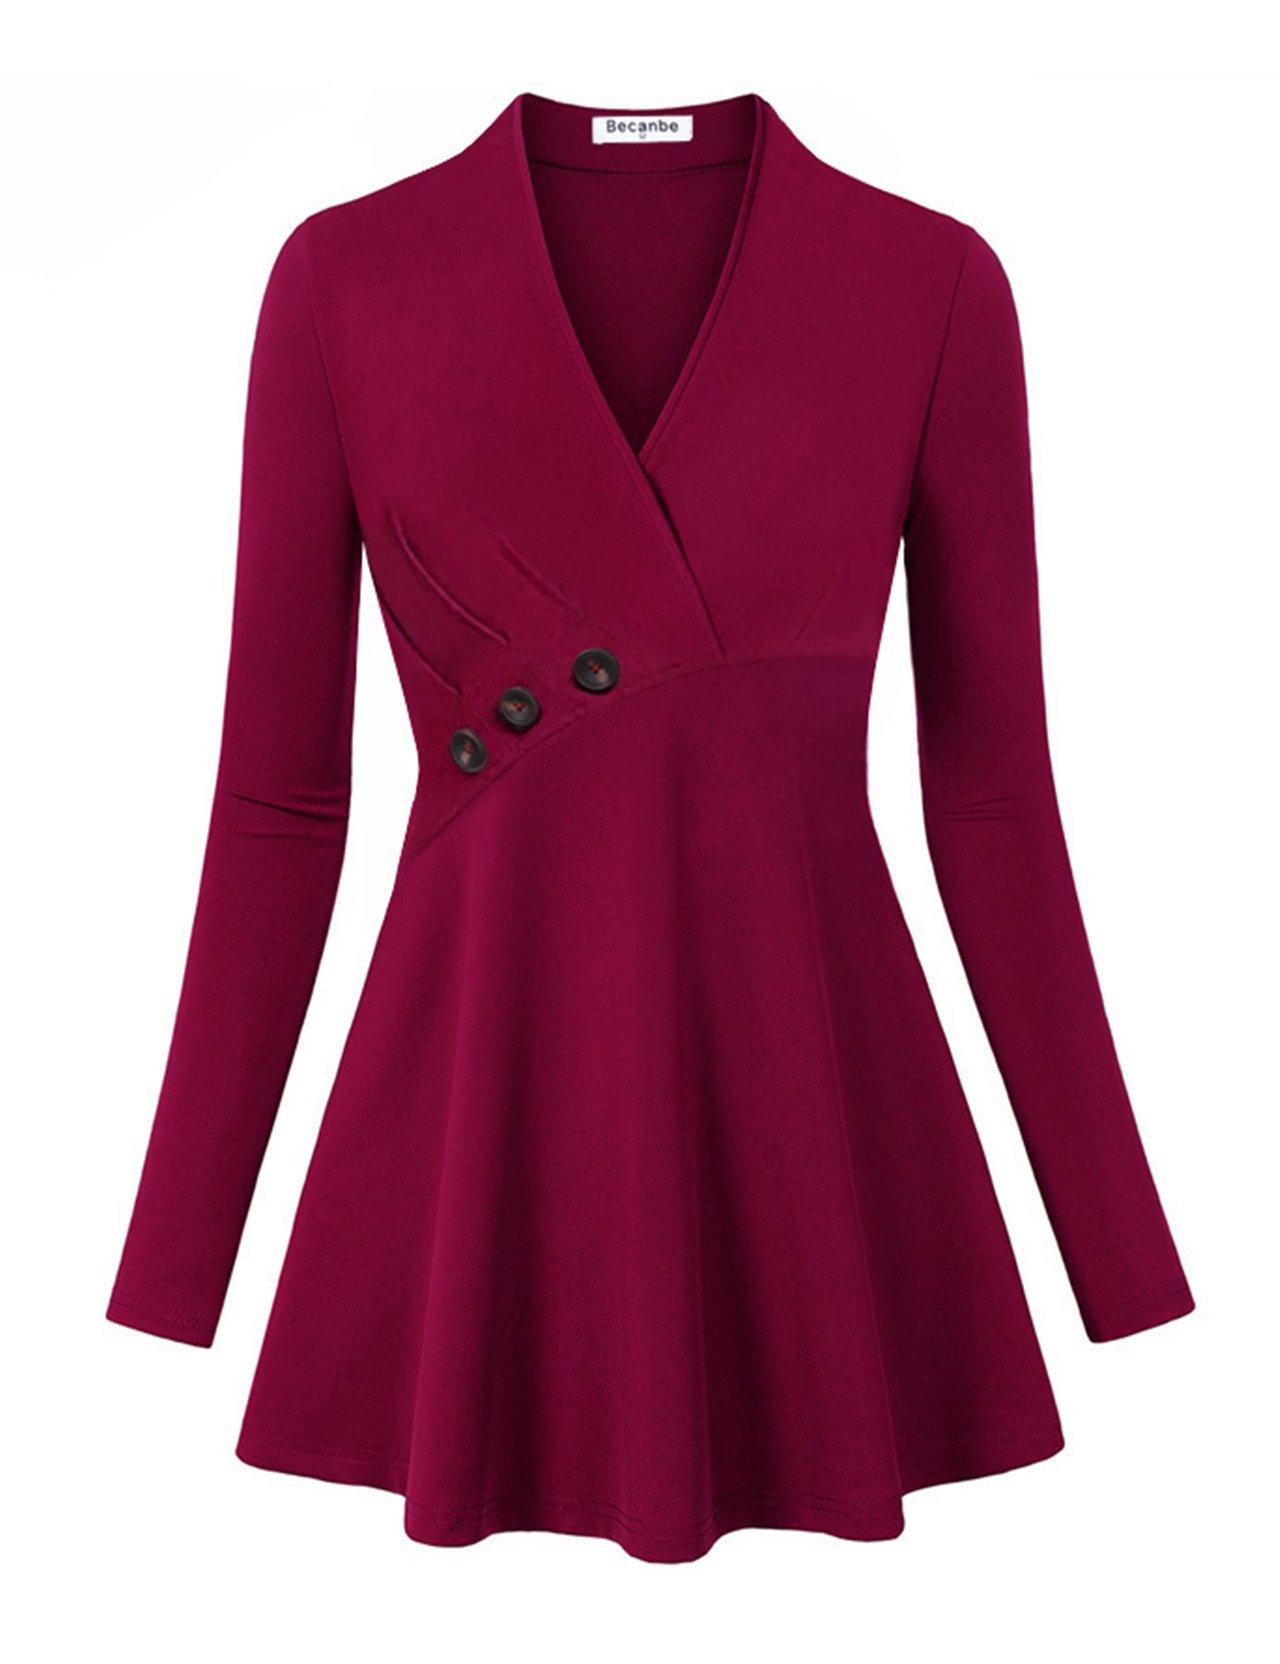 Becanbe Tunics for Women for Leggings, Long Sleeve V Neck Flat Blouse Henley Shirt(Wine,Small)